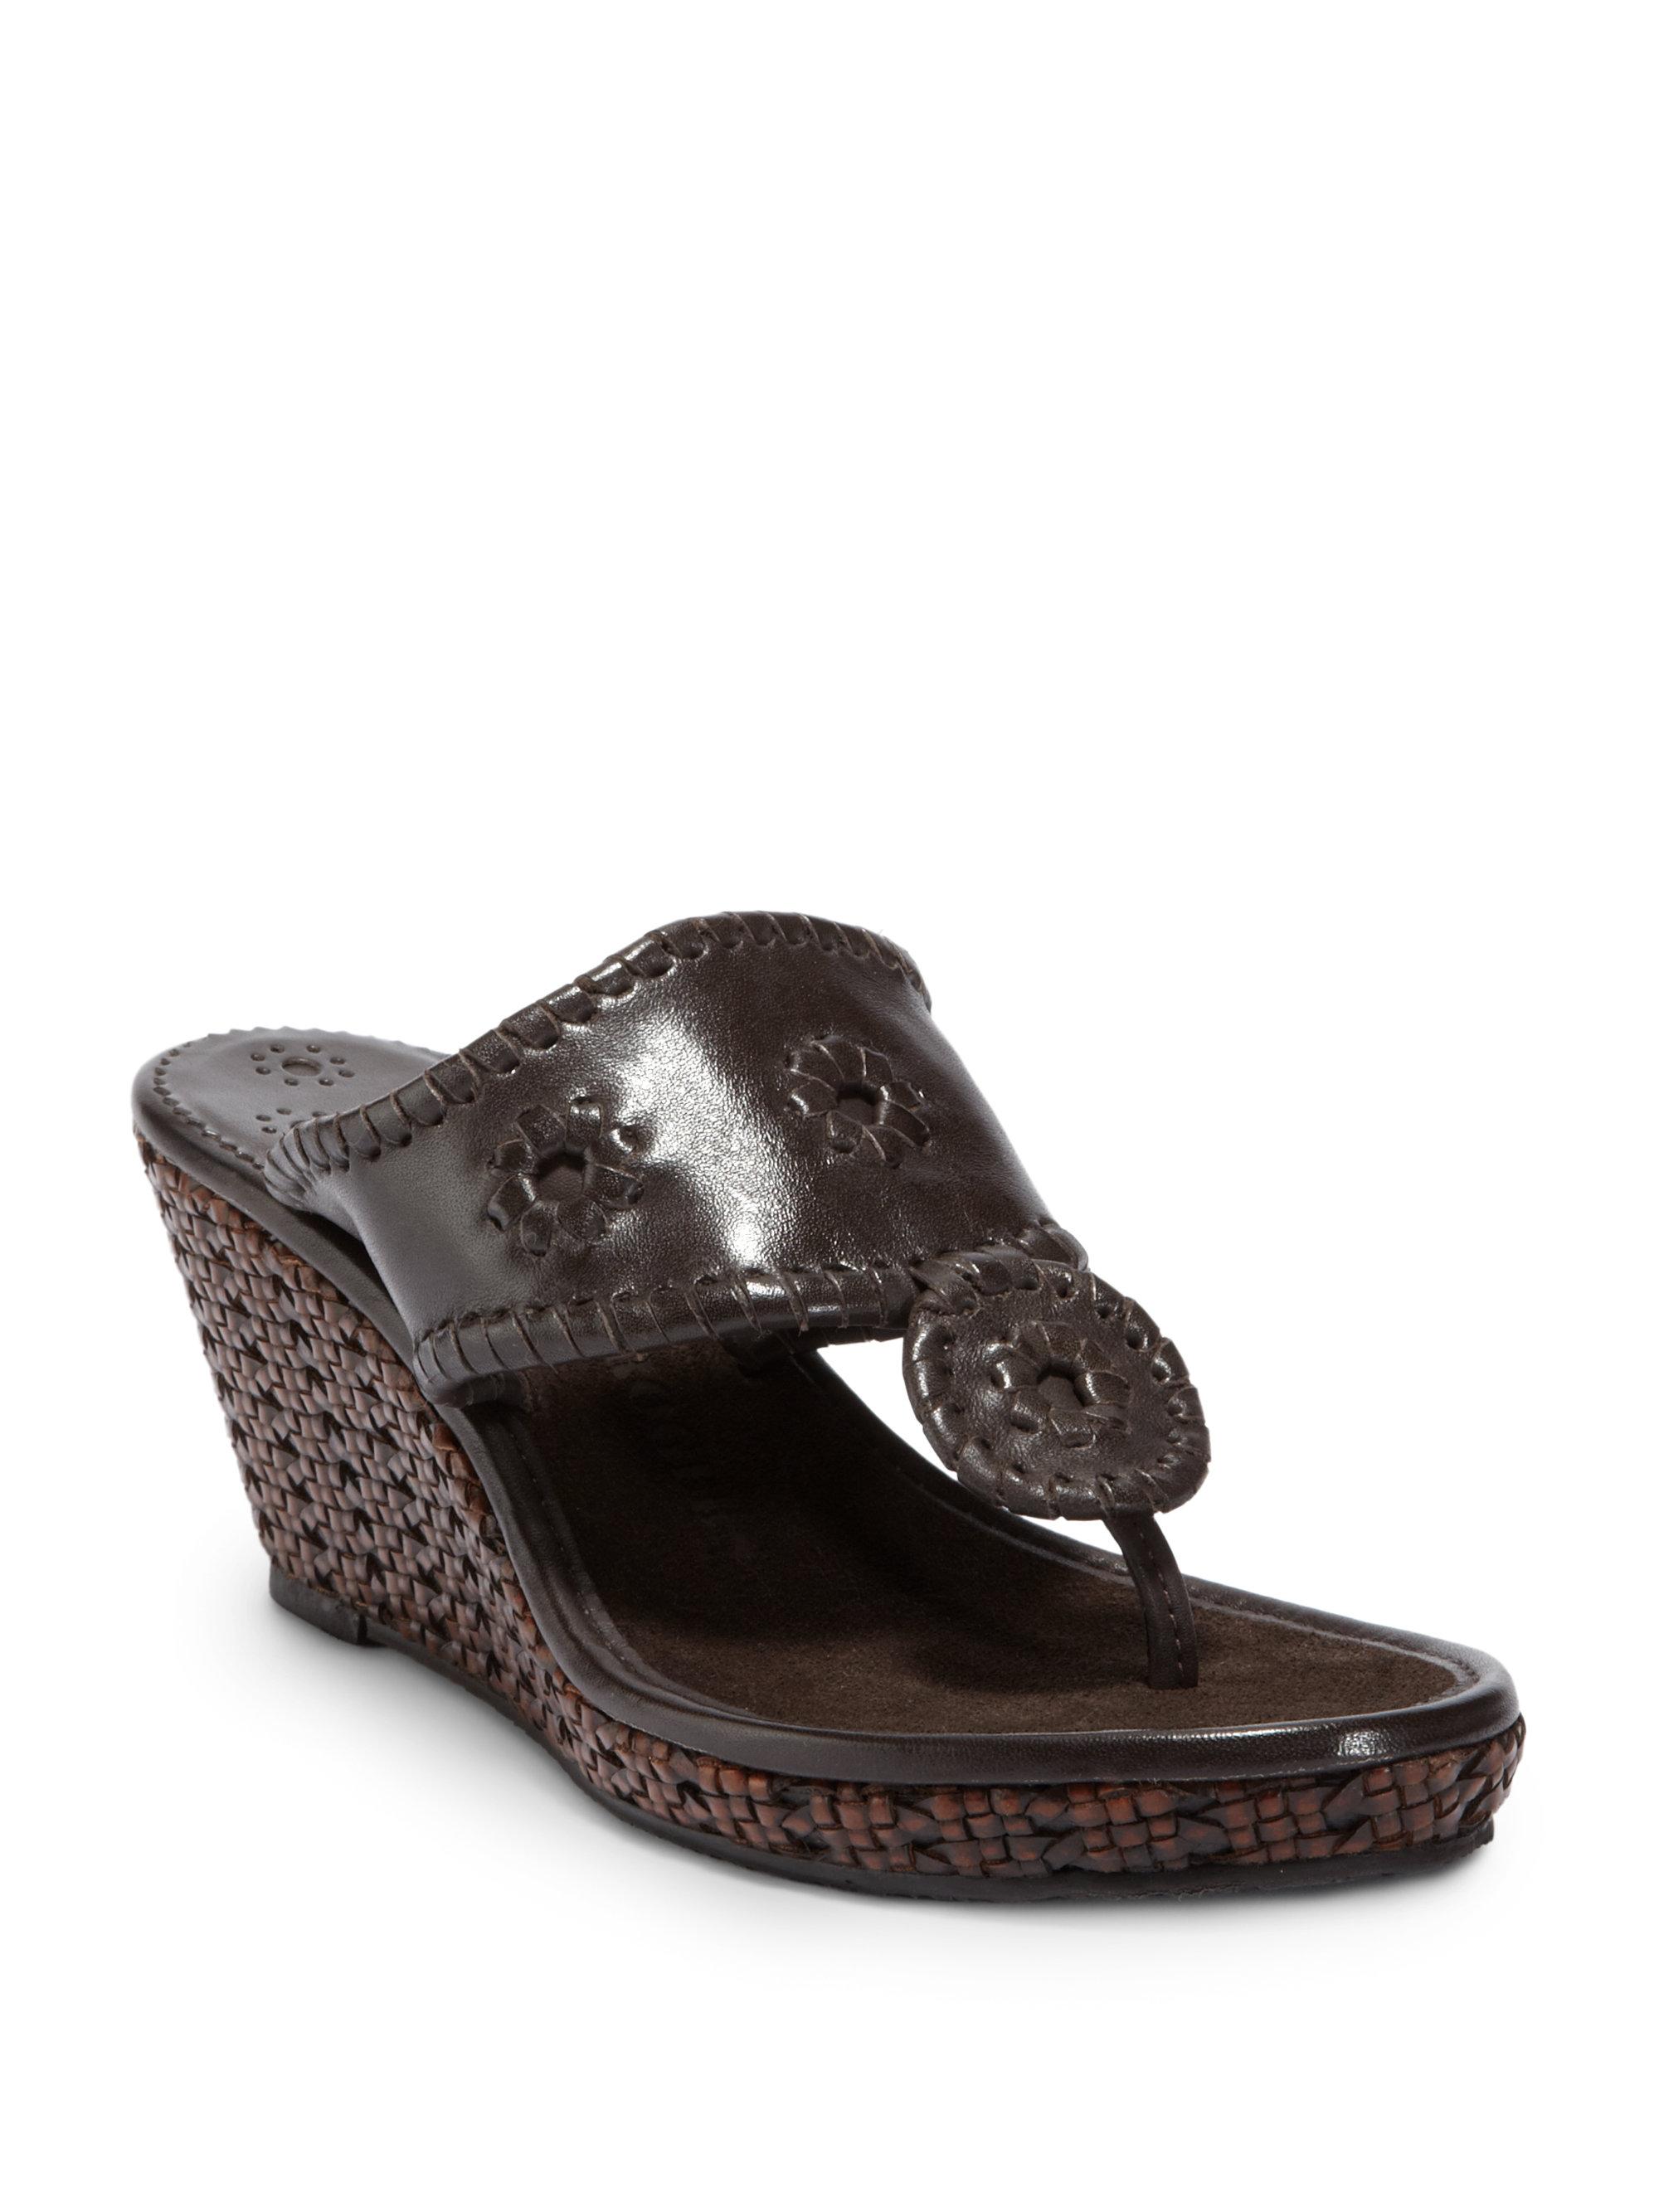 Jack Rogers Del Mar Wedge Sandals In Brown Lyst